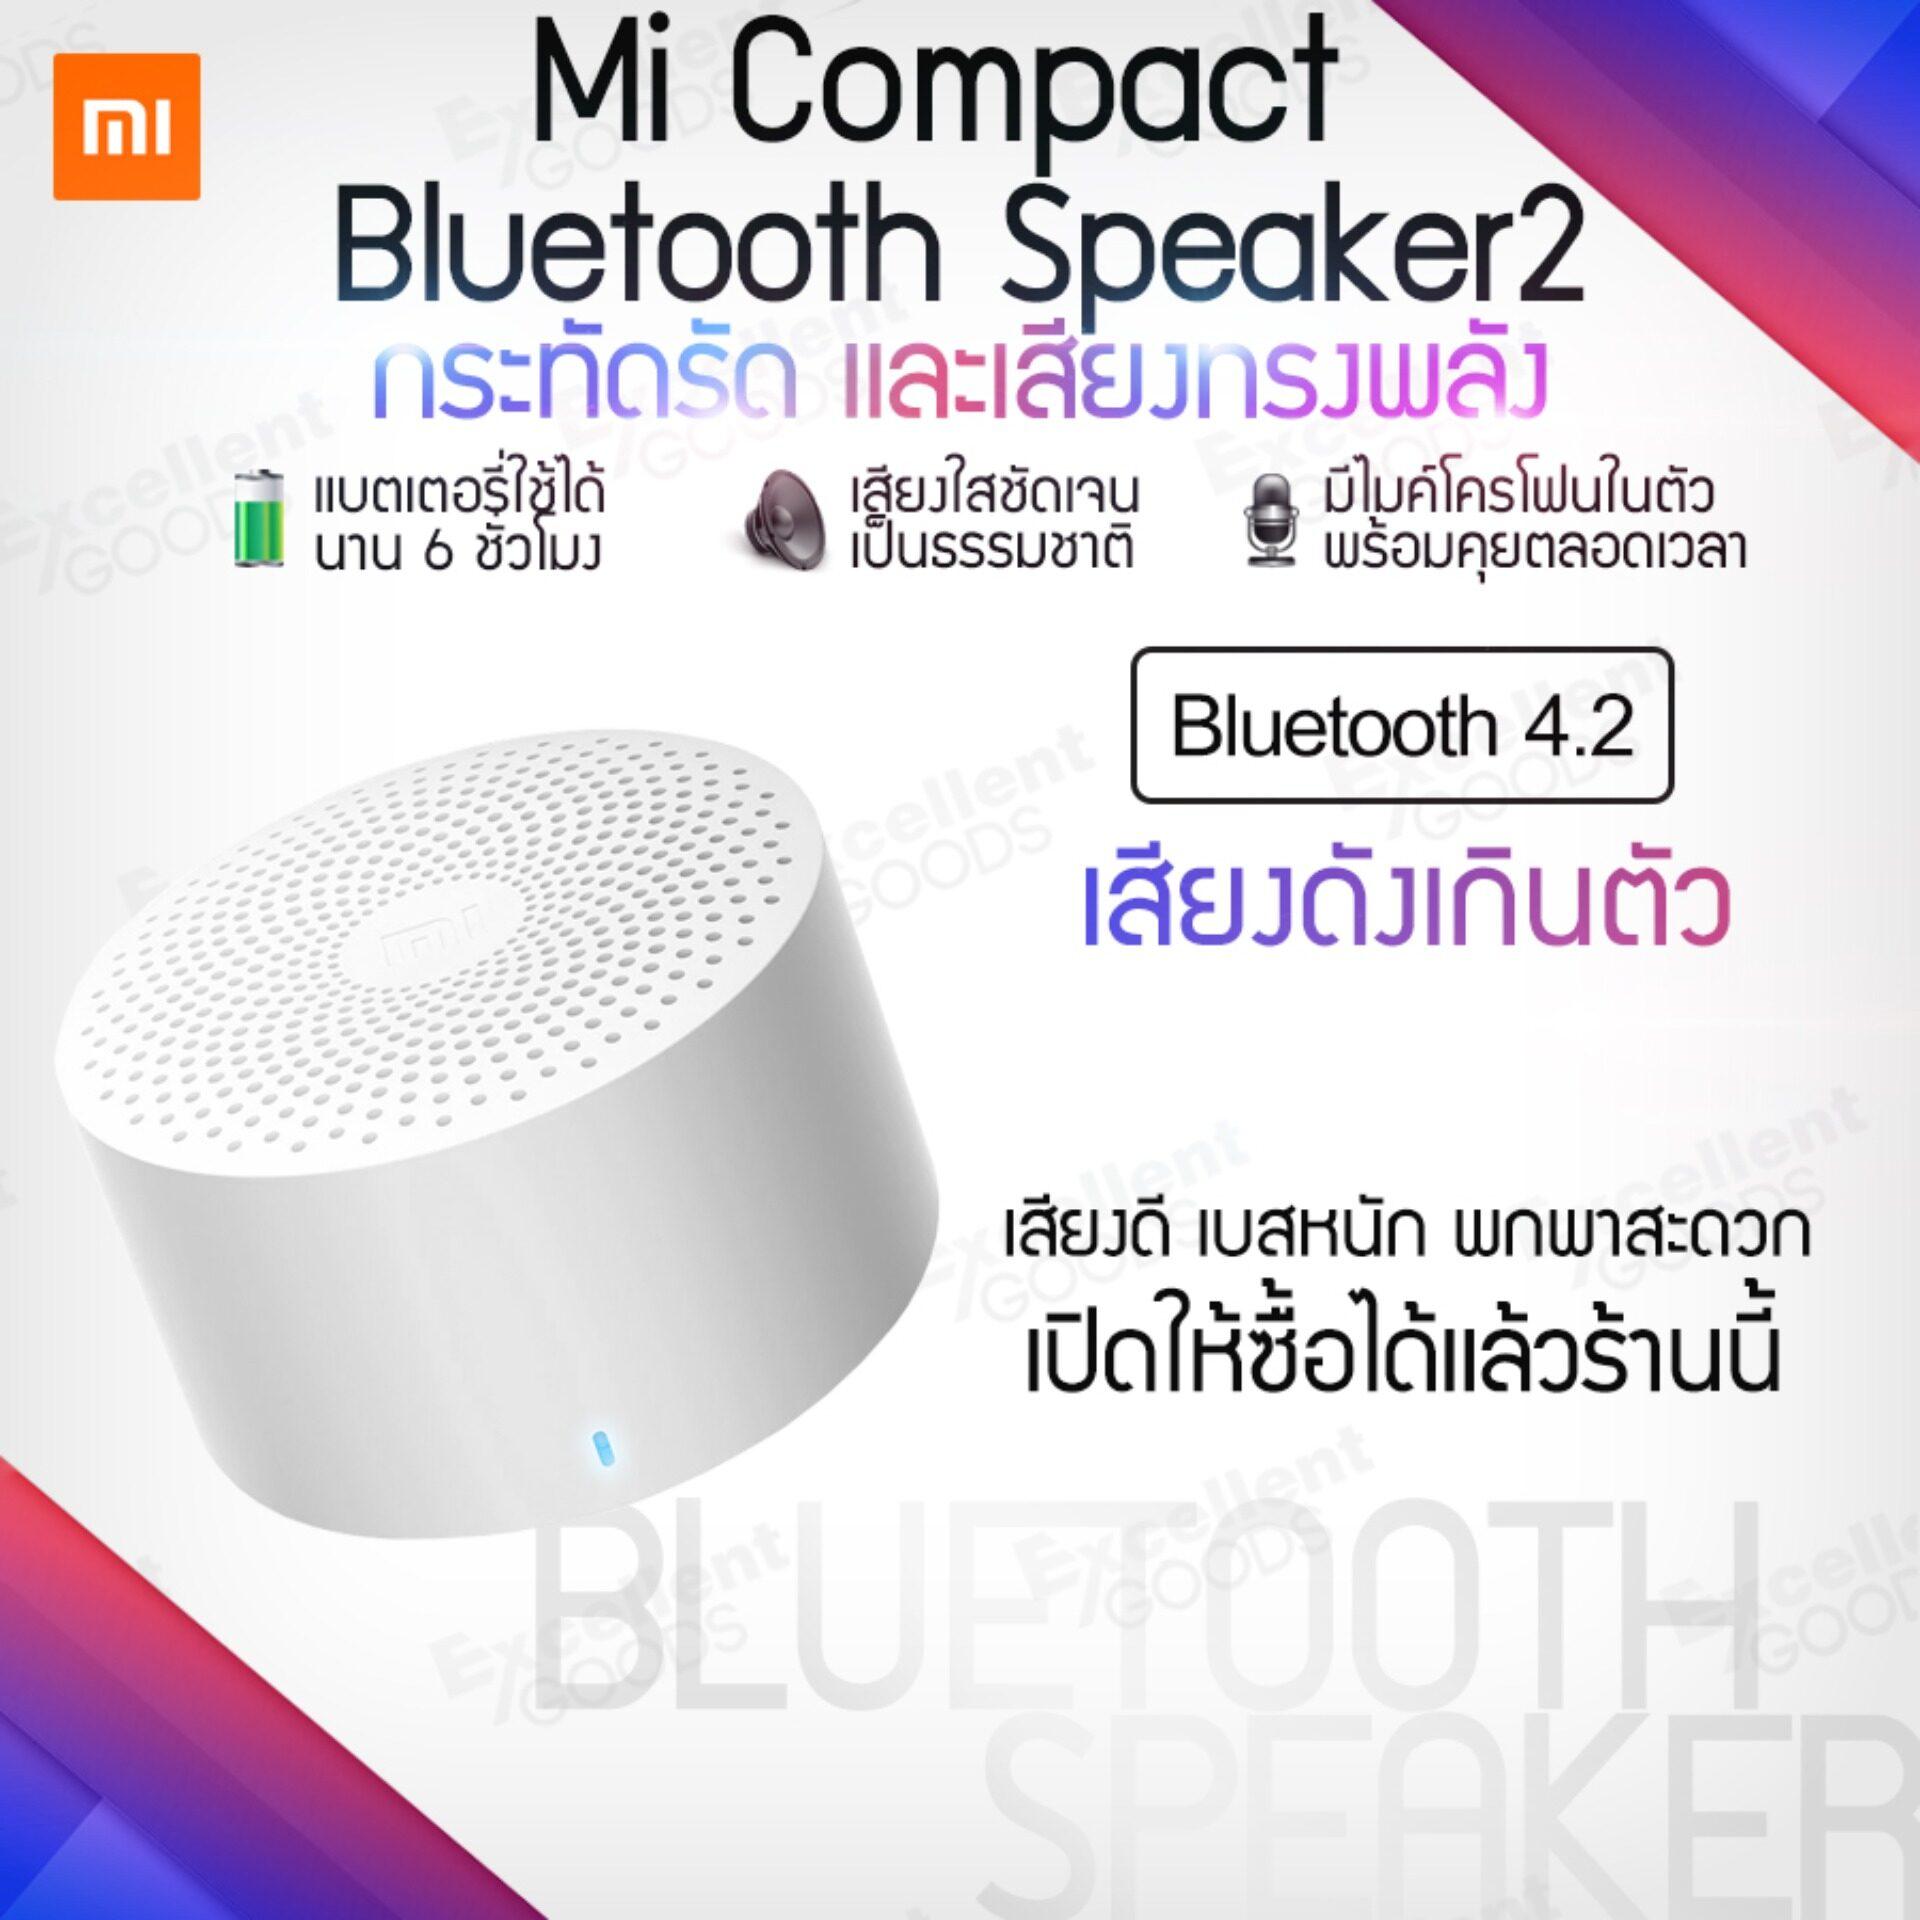 Mi Compact Bluetooth Speaker 2 Portable Outdoors Loudspeaker Box ลำโพงบลูทูธตัวจิ๋ว เสียงแจ๋ว เบสแน่นๆ พกพาสะดวก  [รับประกันร้าน  3 เดือน].